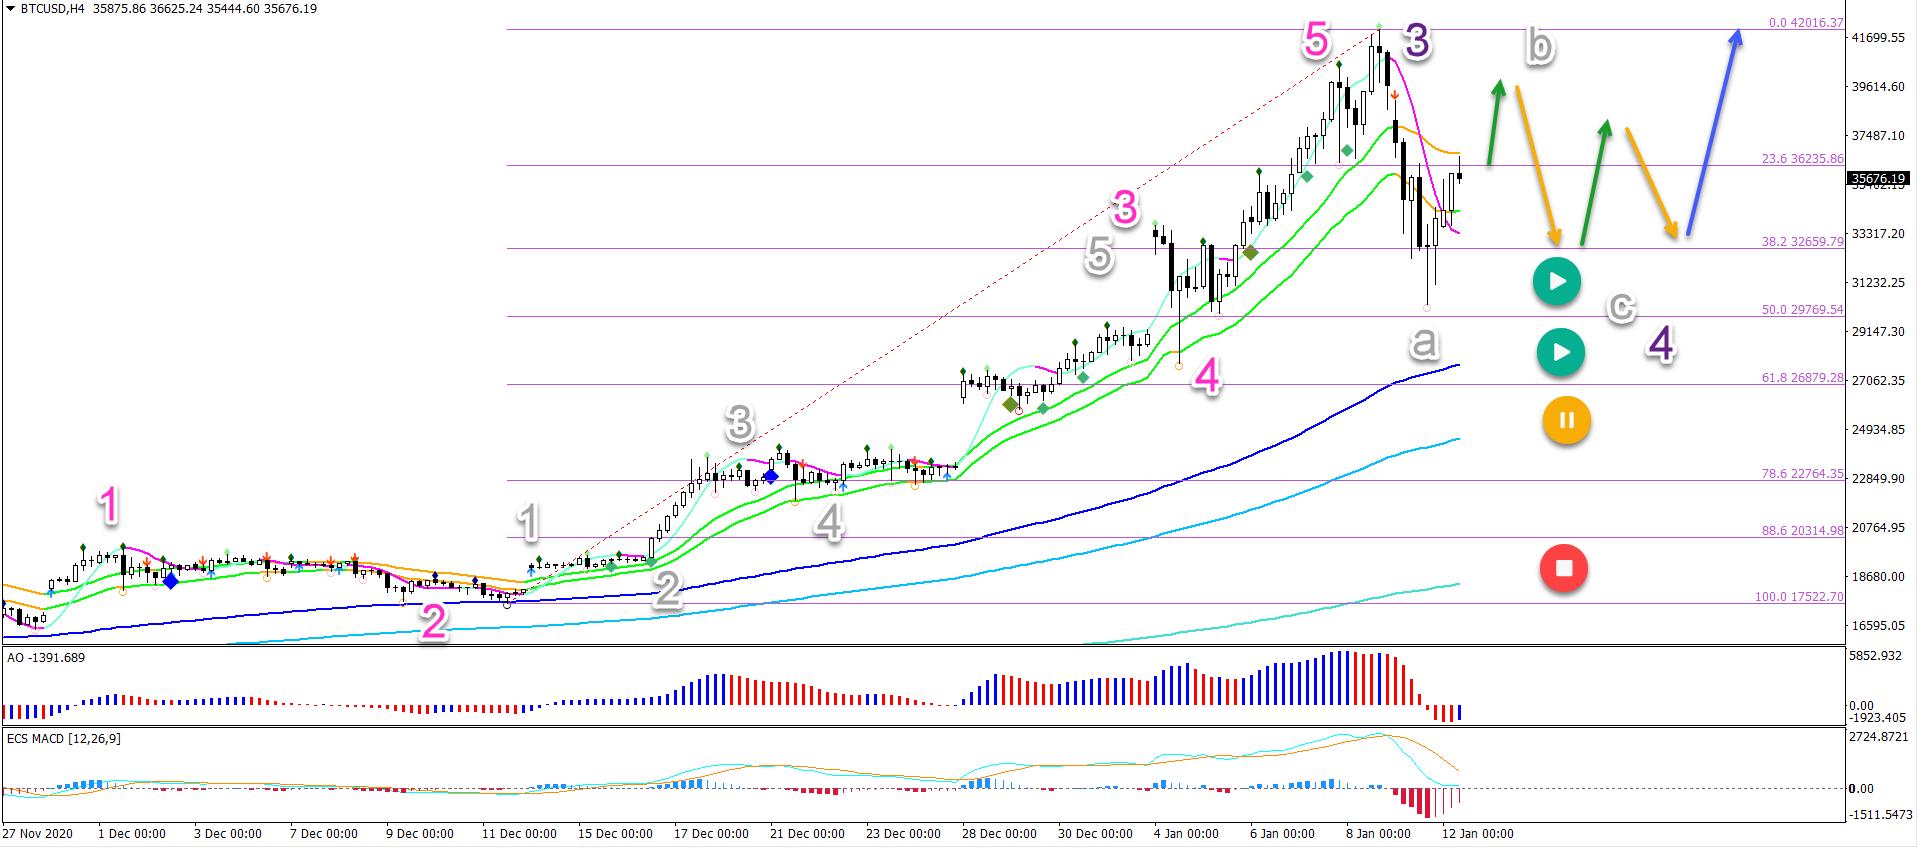 BTC/USD 12.01.2021 4 hour chart